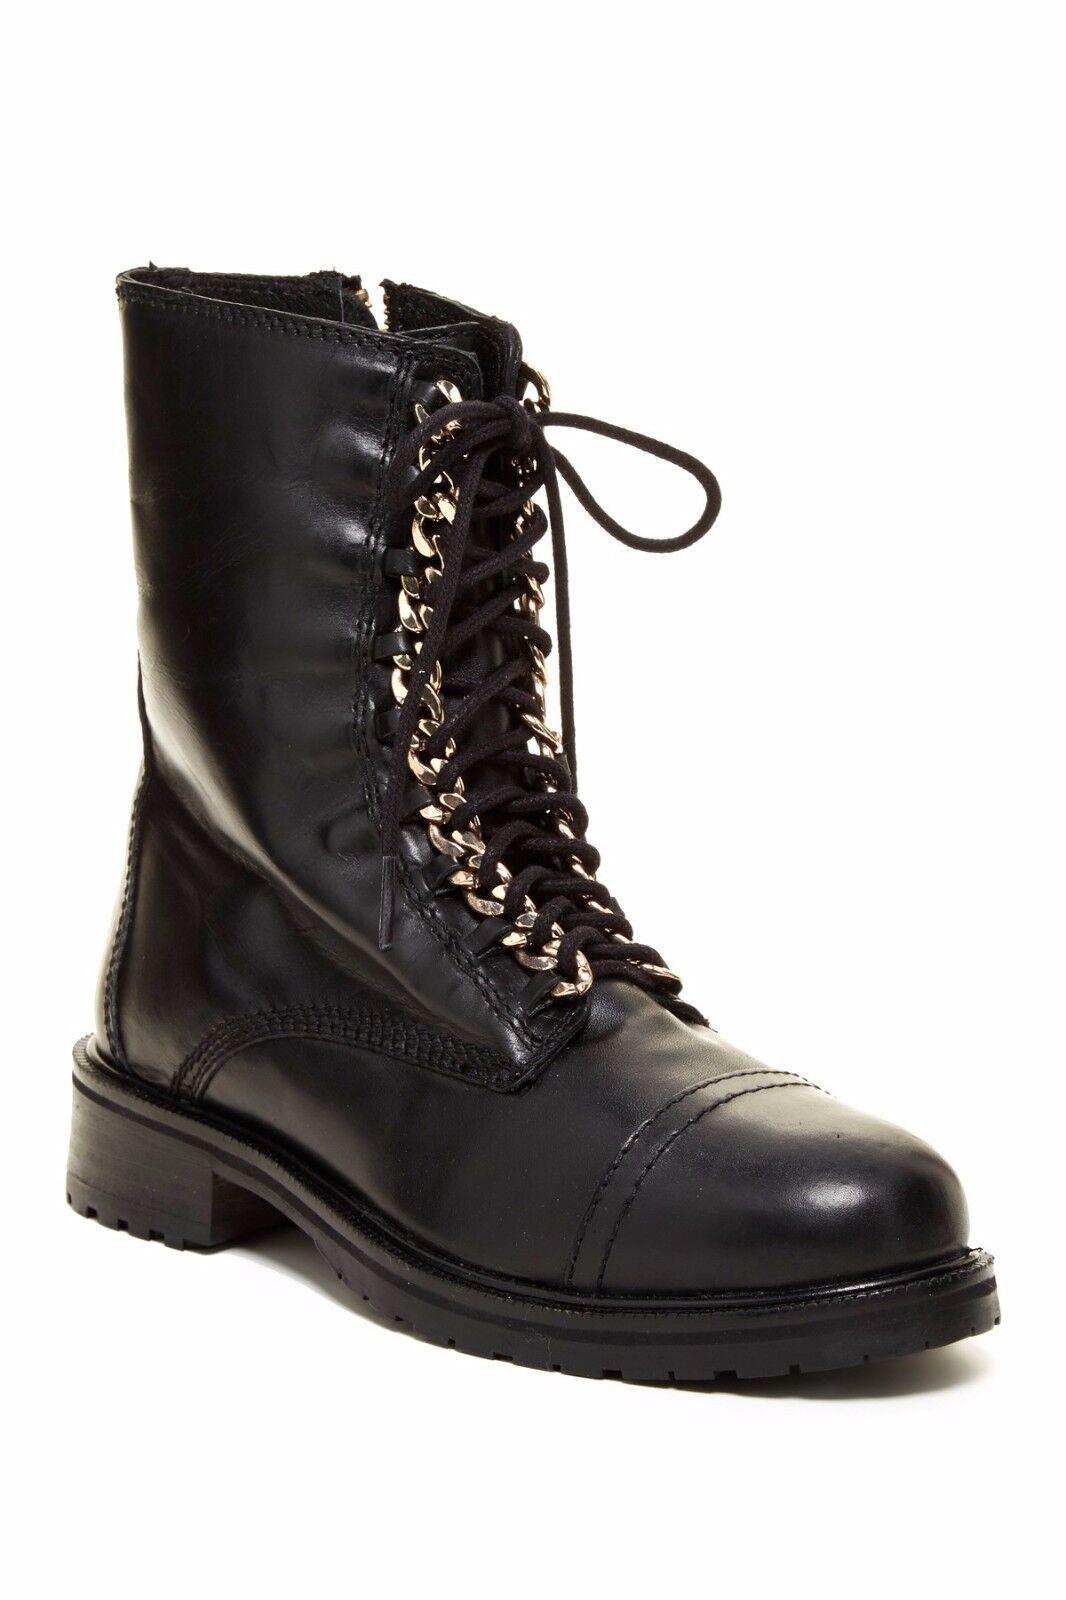 New Toe Steve Madden 2chain Cap Toe New Stiefel Damens'Größe 8.5 c090de